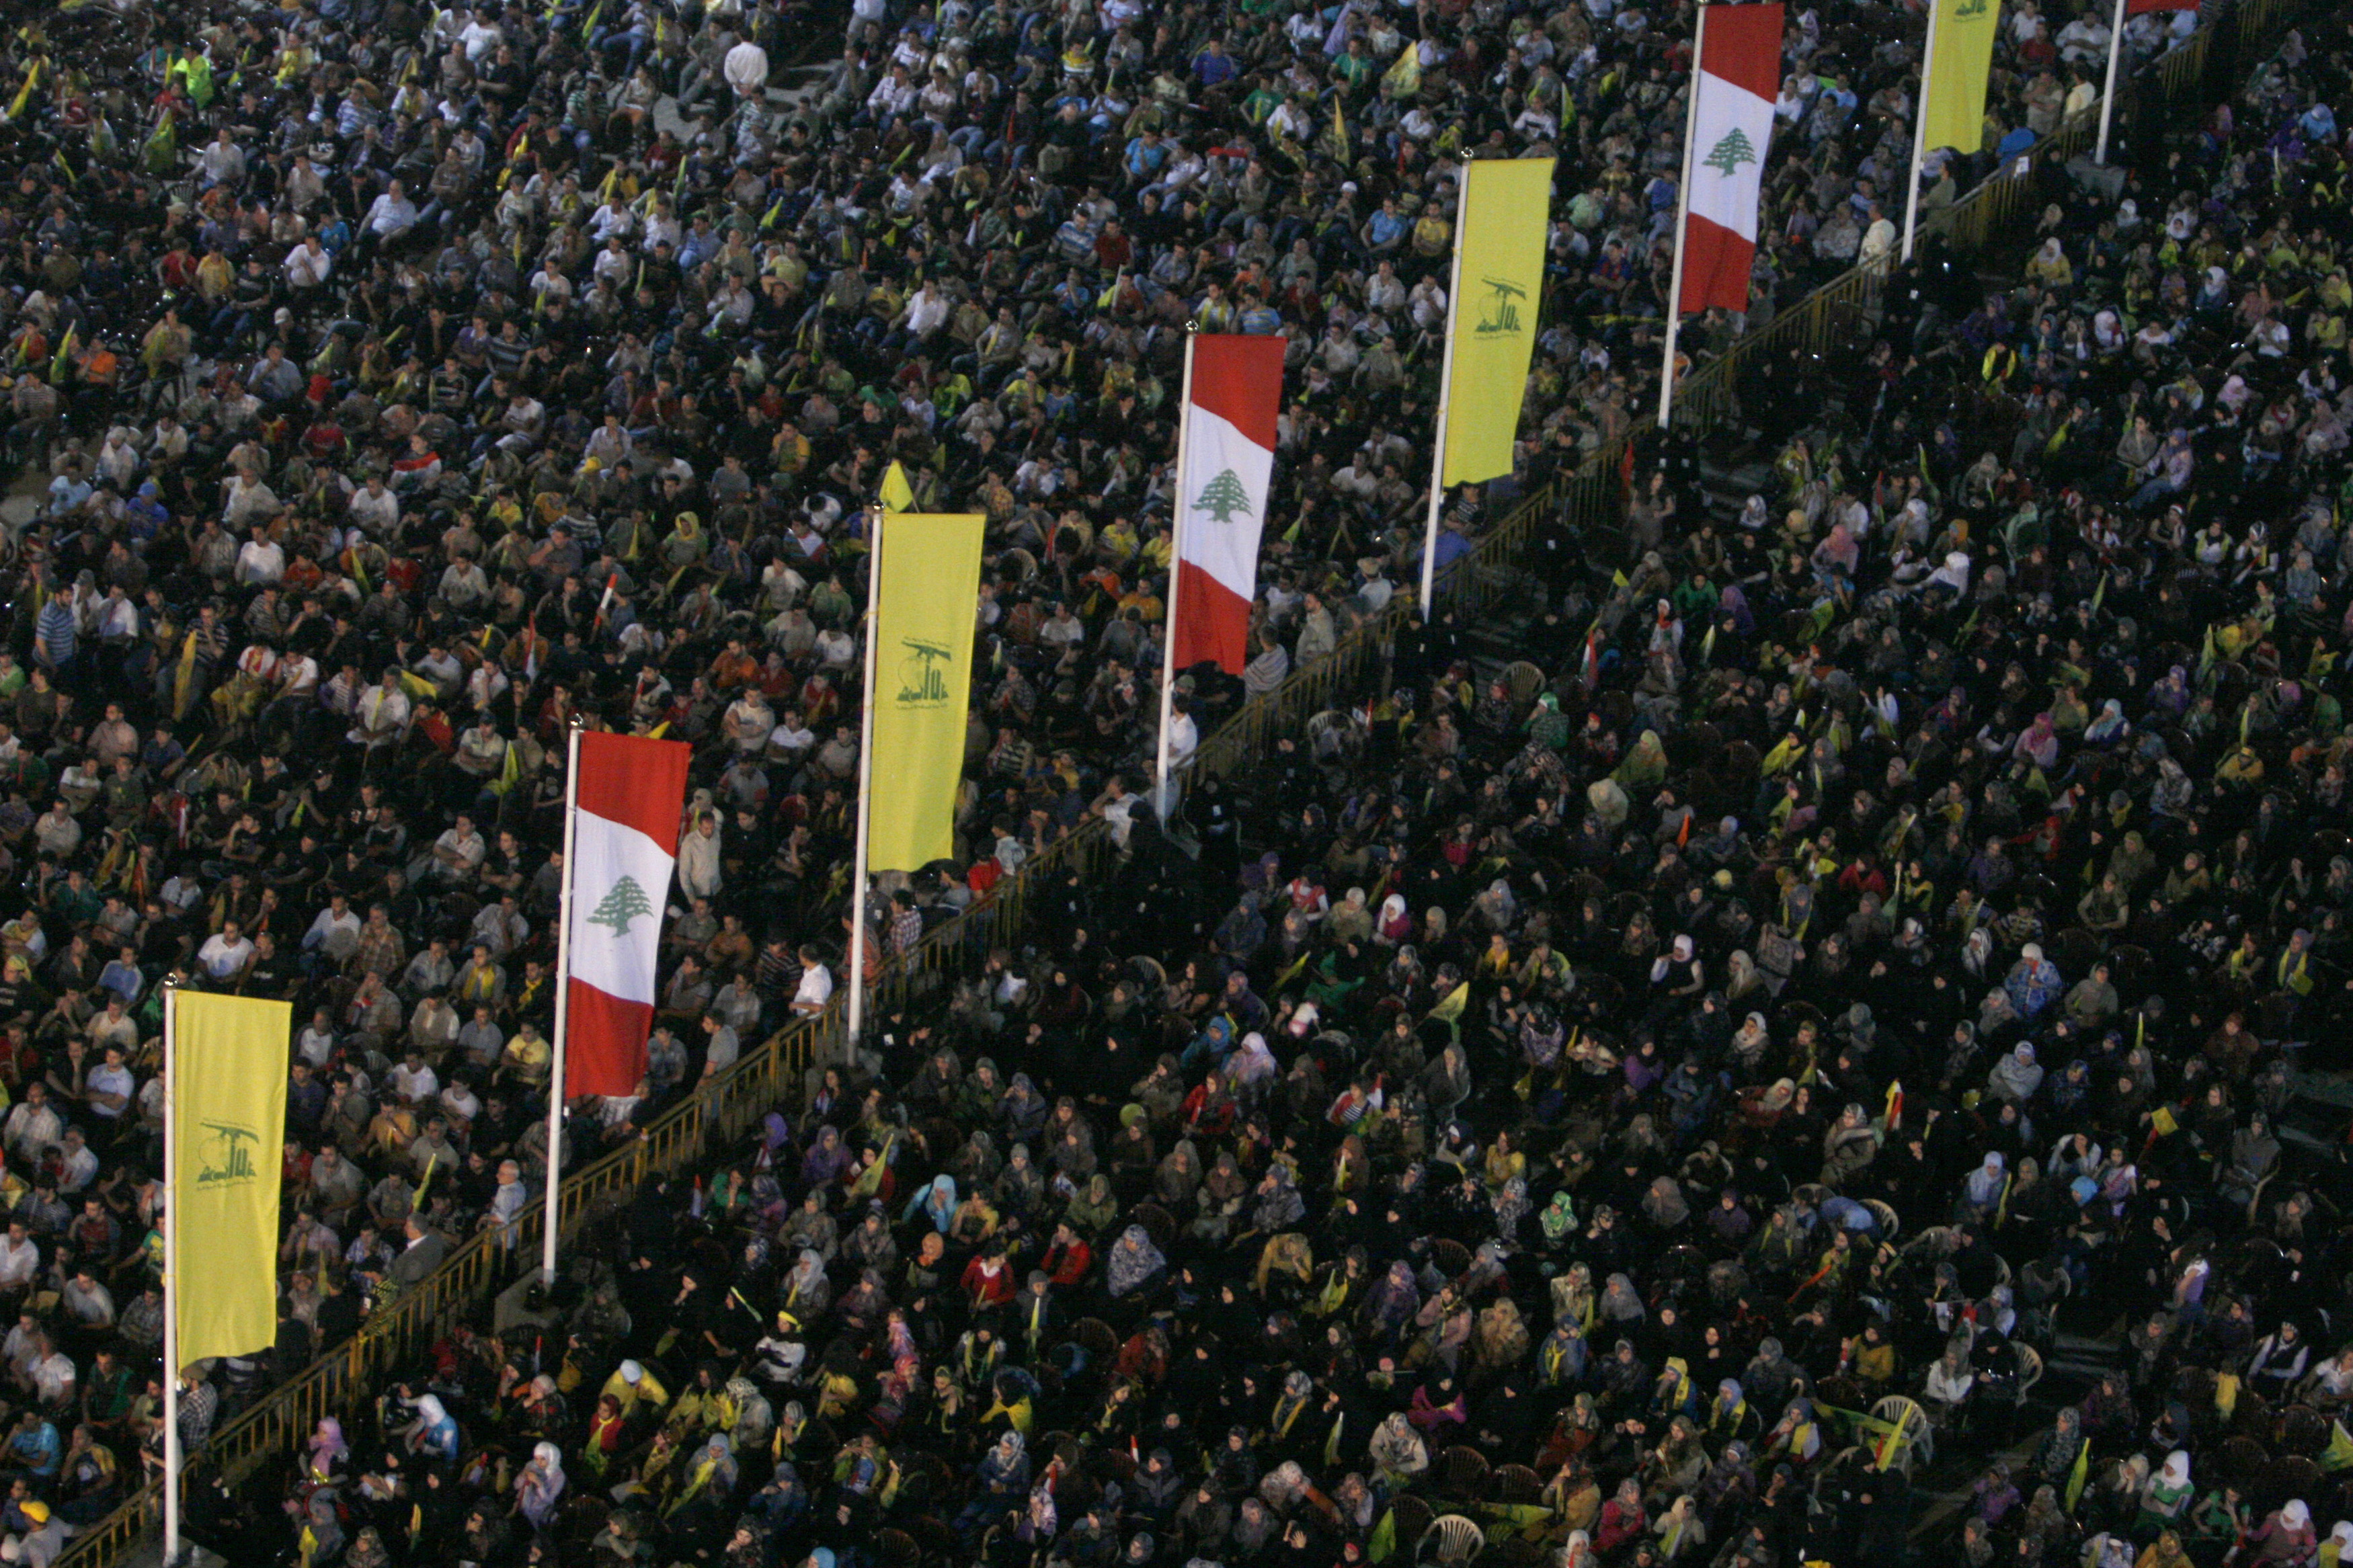 Hezbollah: Revolutionary Iran's most successful export